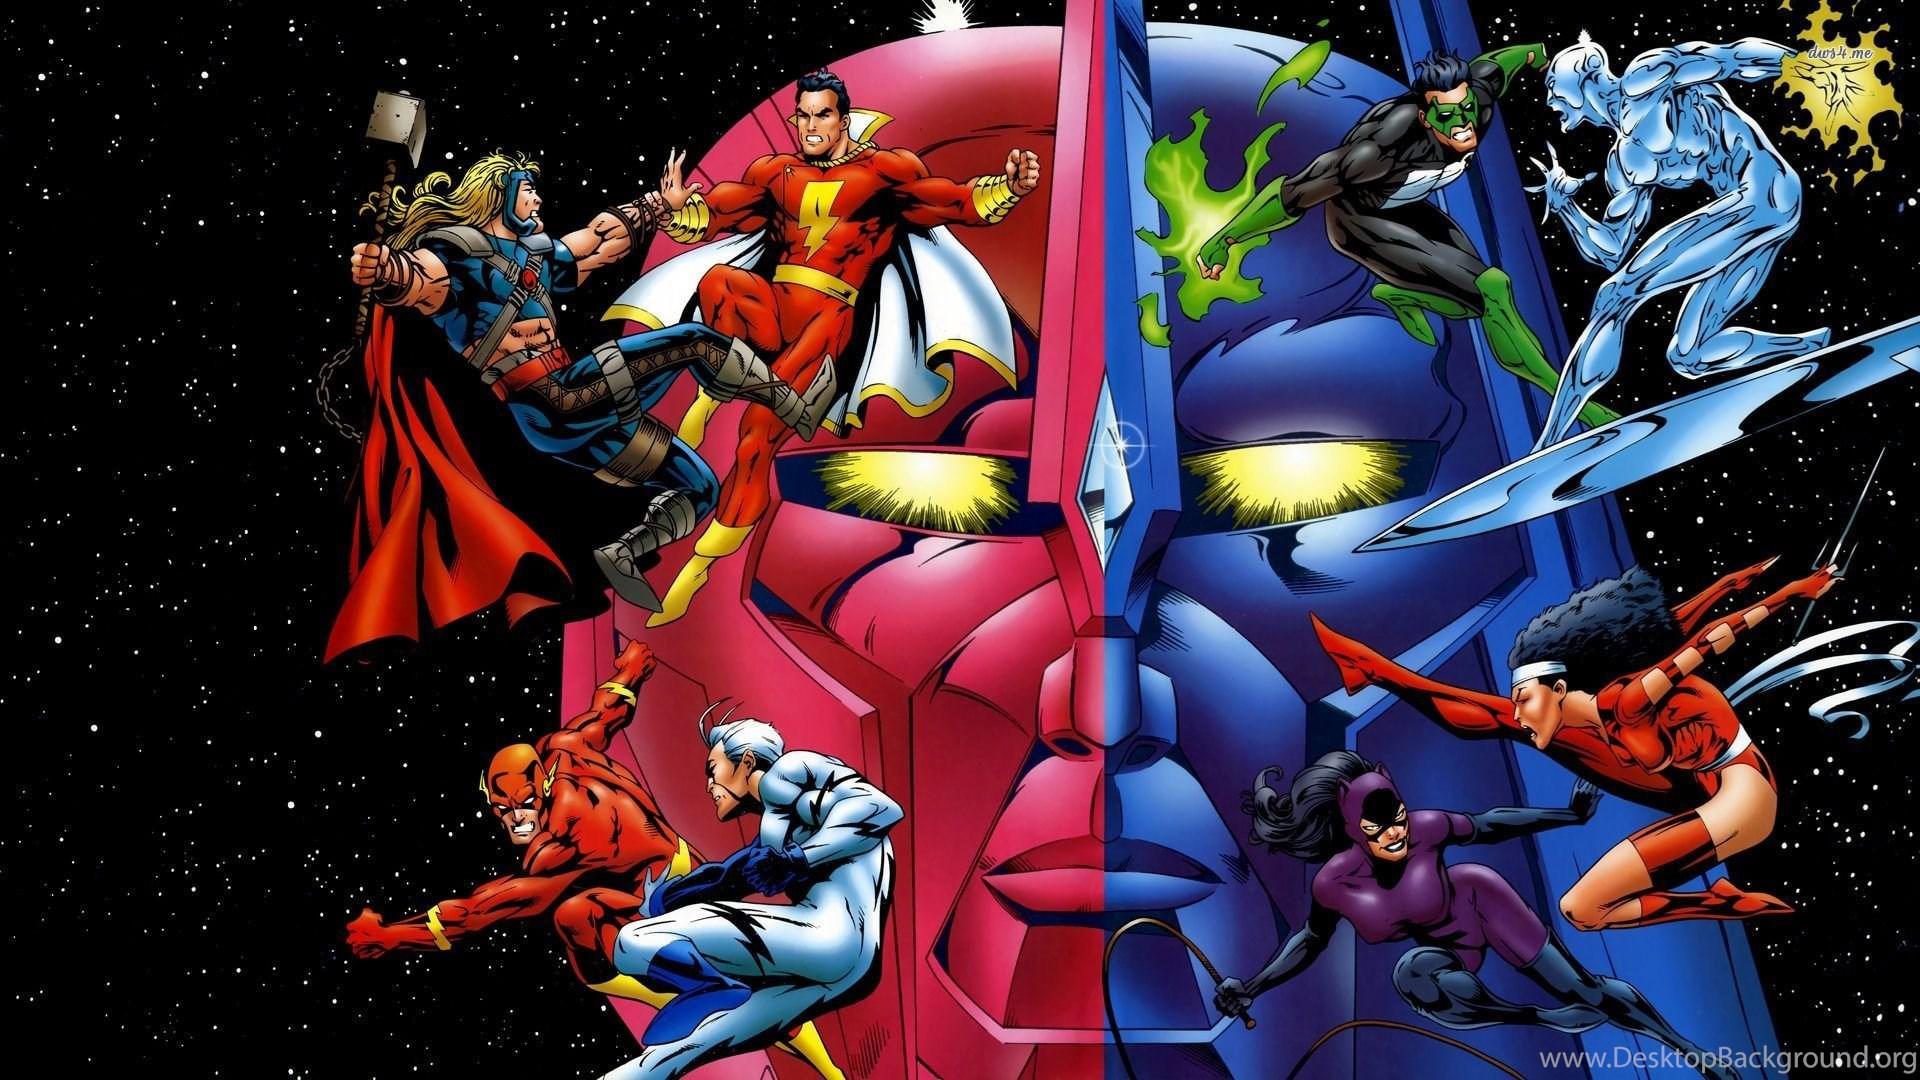 Wallpapers superheroes marvel x dc comics vs 1920x1080 desktop background - Marvel and dc wallpapers ...